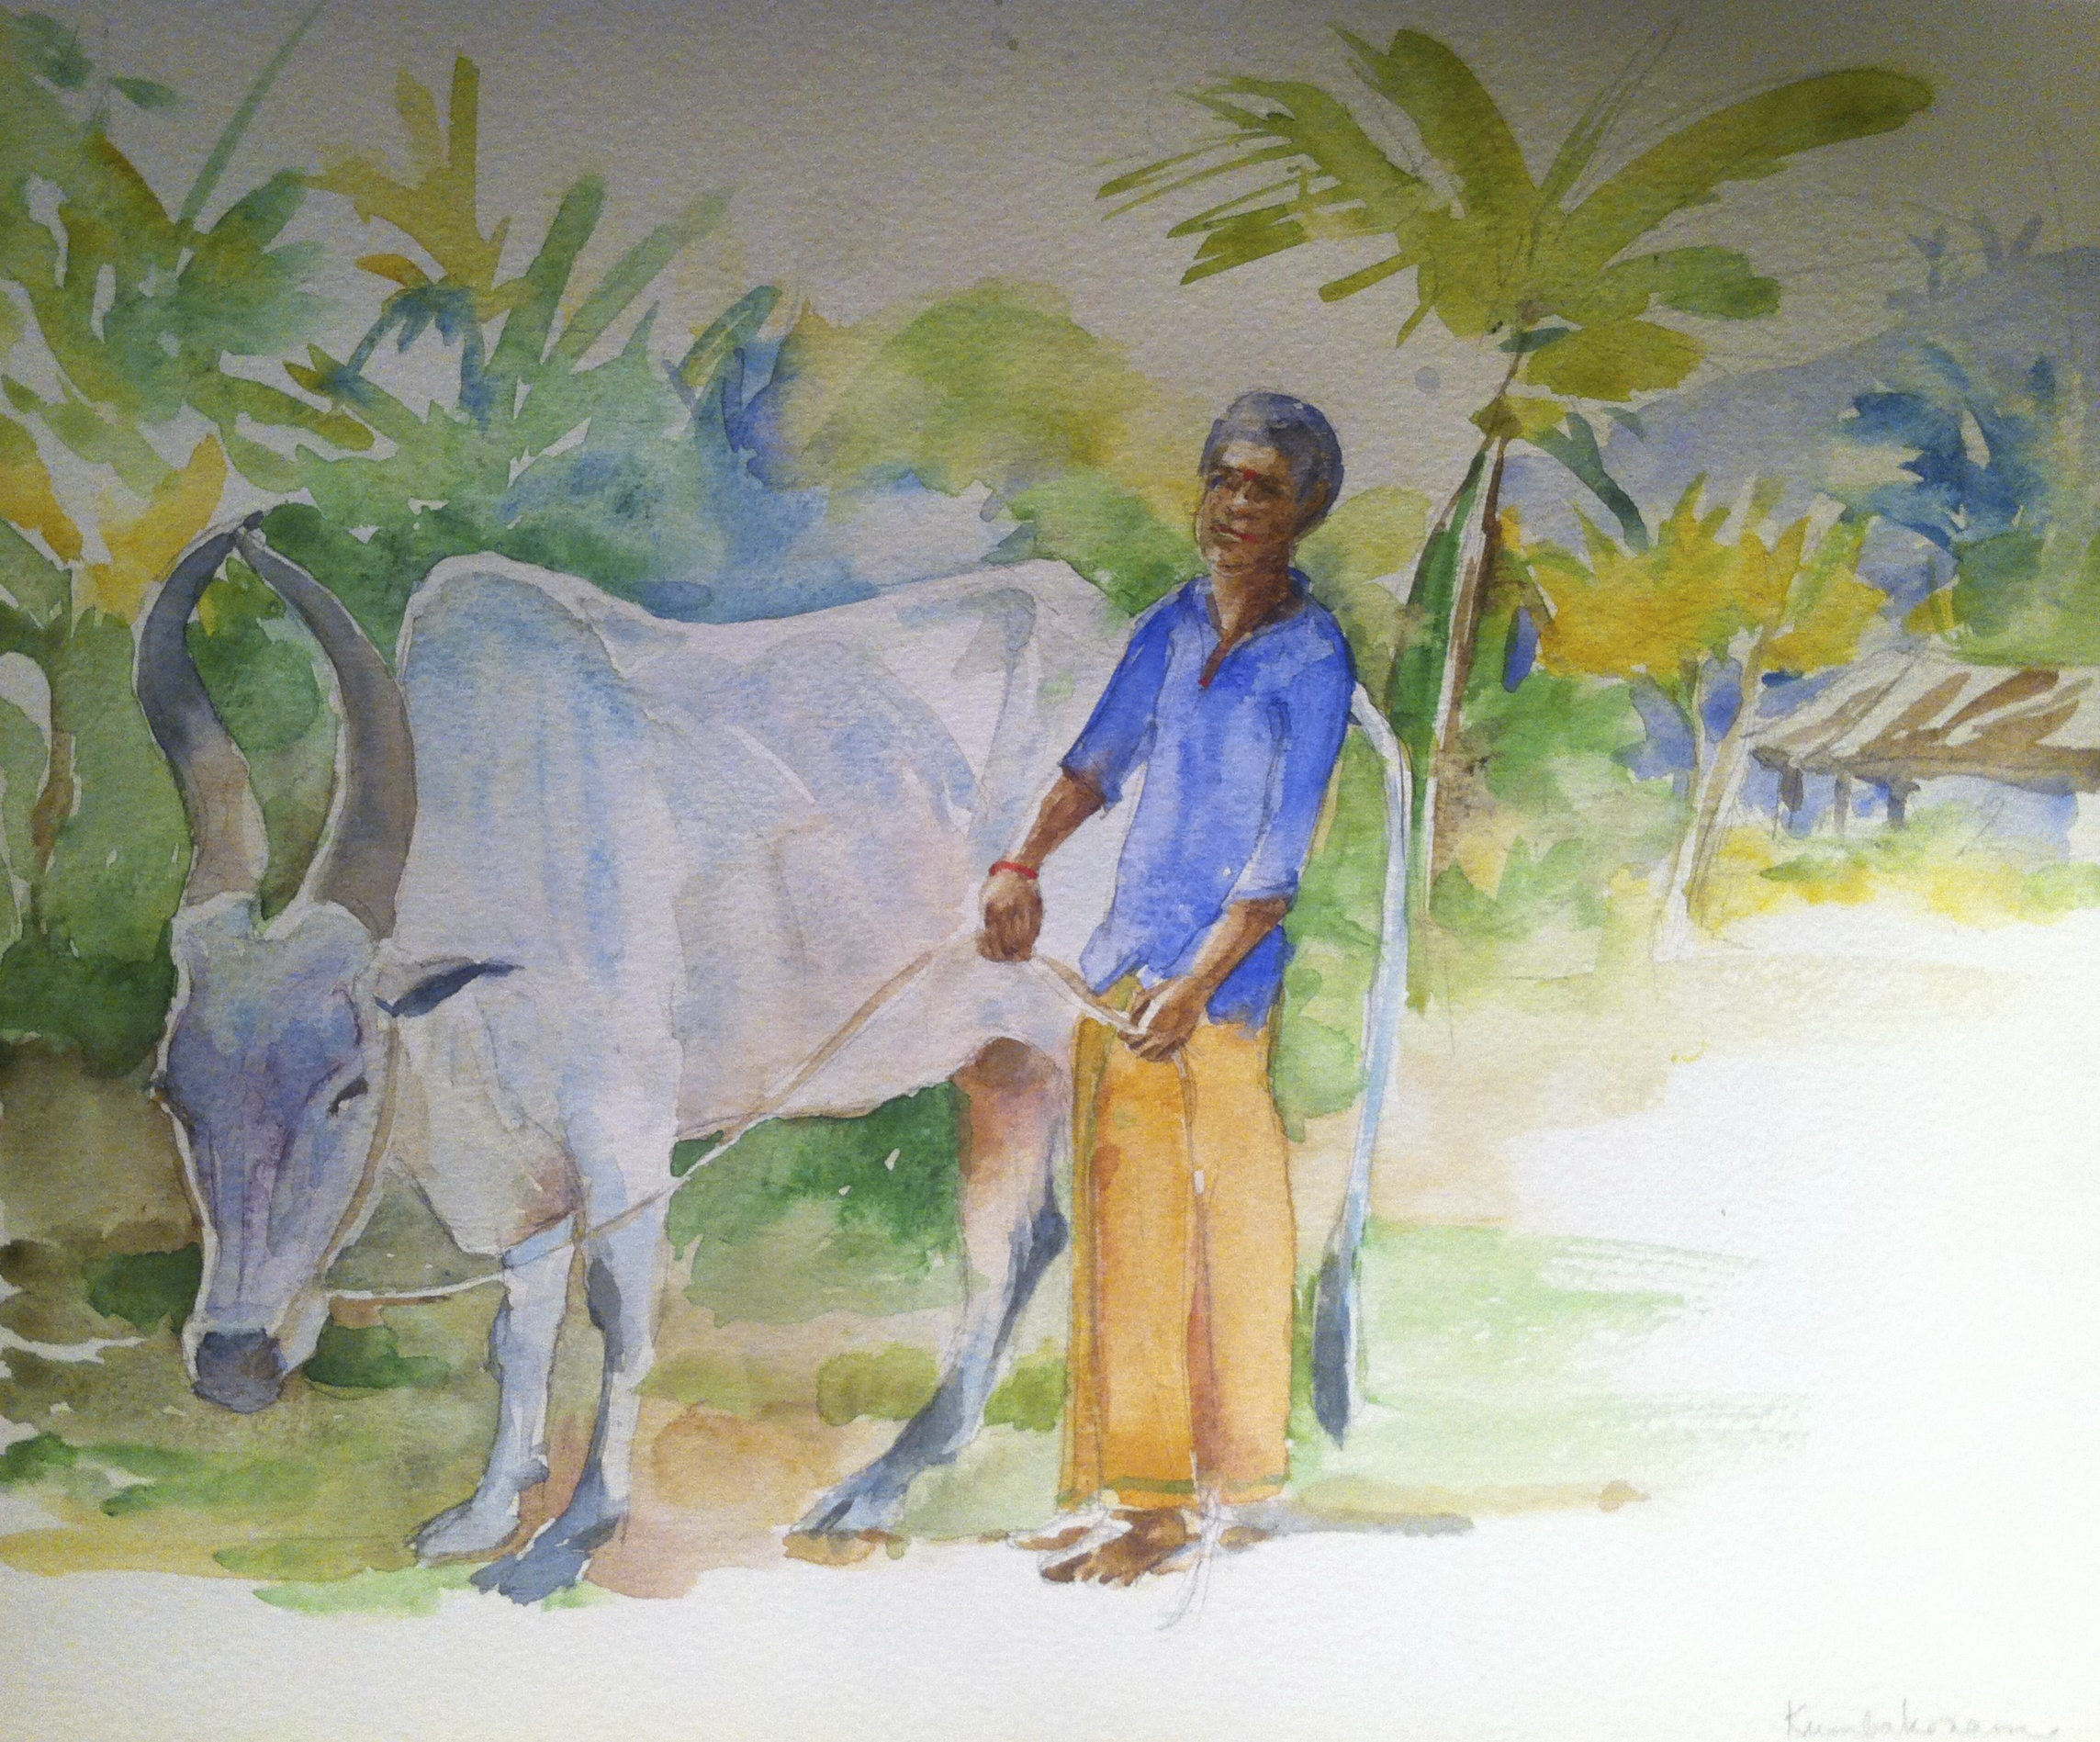 Gopala. Cowherd in Kumbakonam, Tamil Nadu